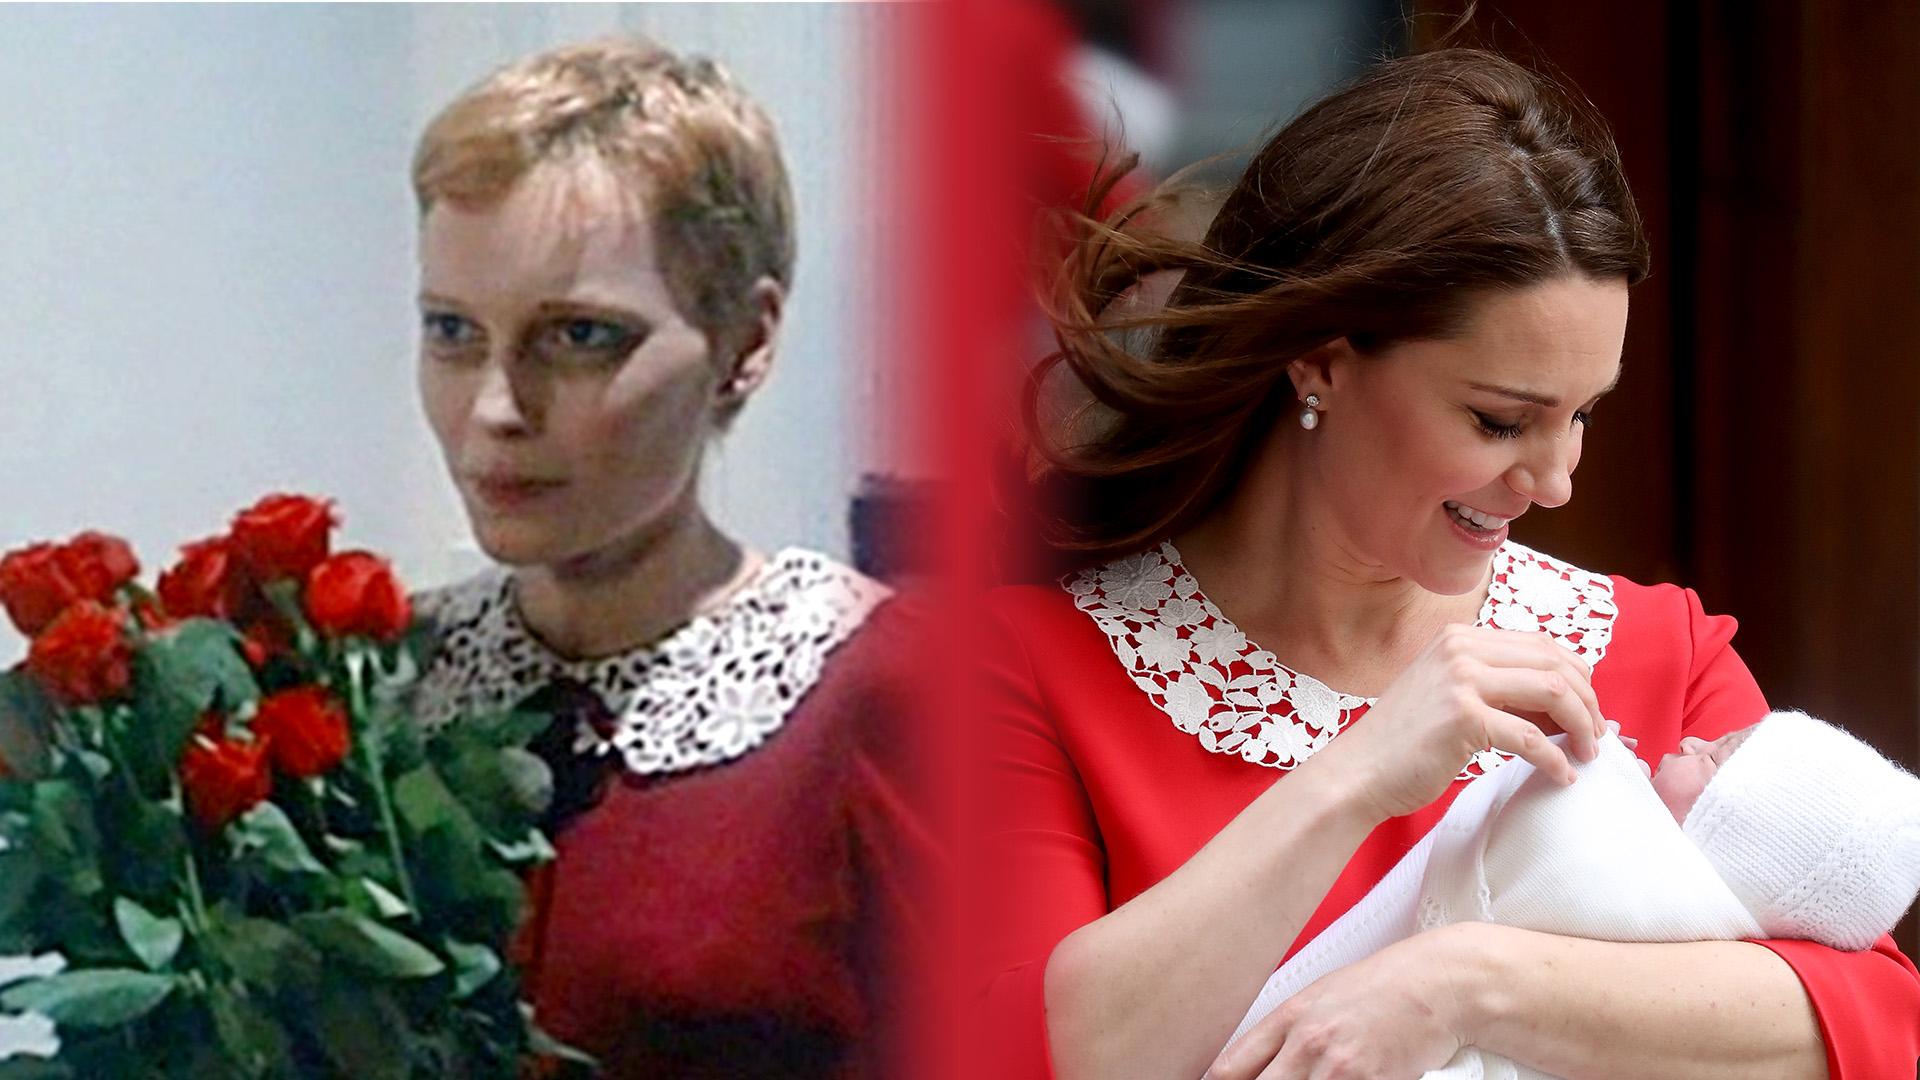 Comparan a Kate Middleton con una madre paranoica que tuvo un hijo ...